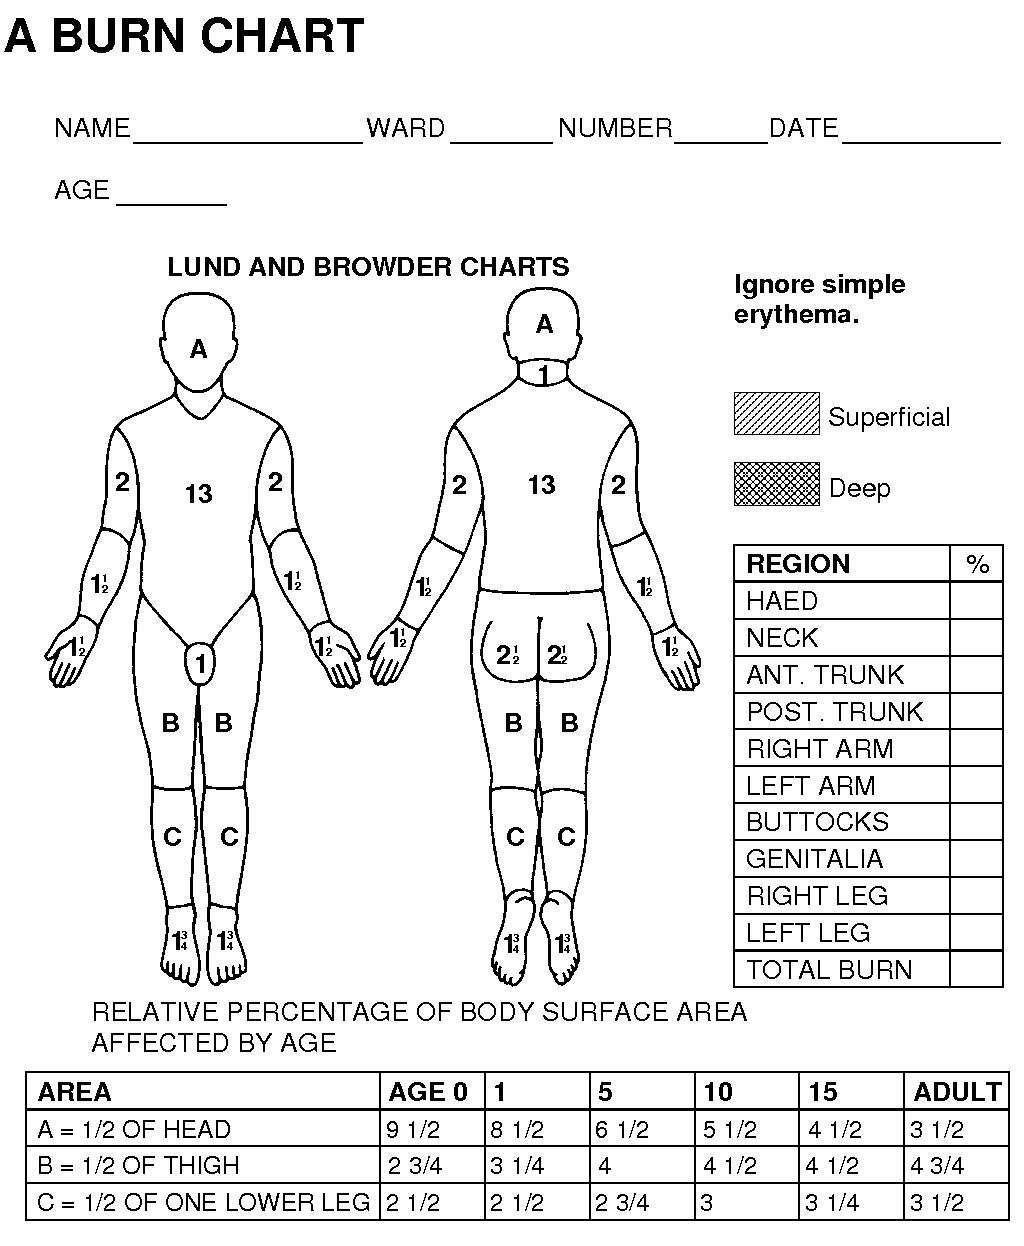 wound assessment diagram electrolux wiring on vacuum lund browder burn chart car interior design